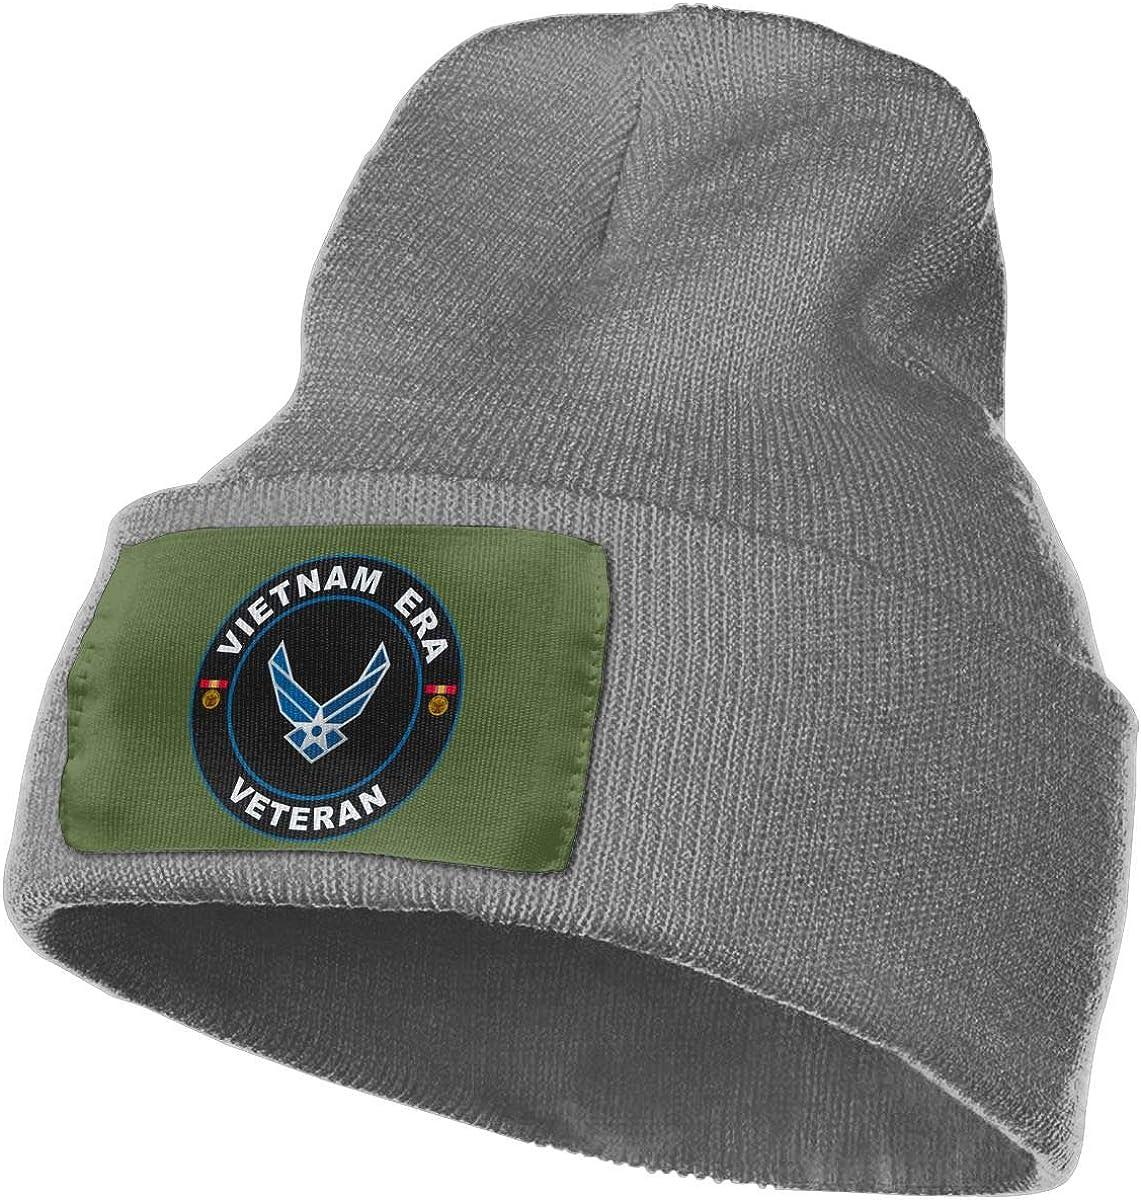 United States Air Force Vietnam Era Veteran Mens Beanie Cap Skull Cap Winter Warm Knitting Hats.